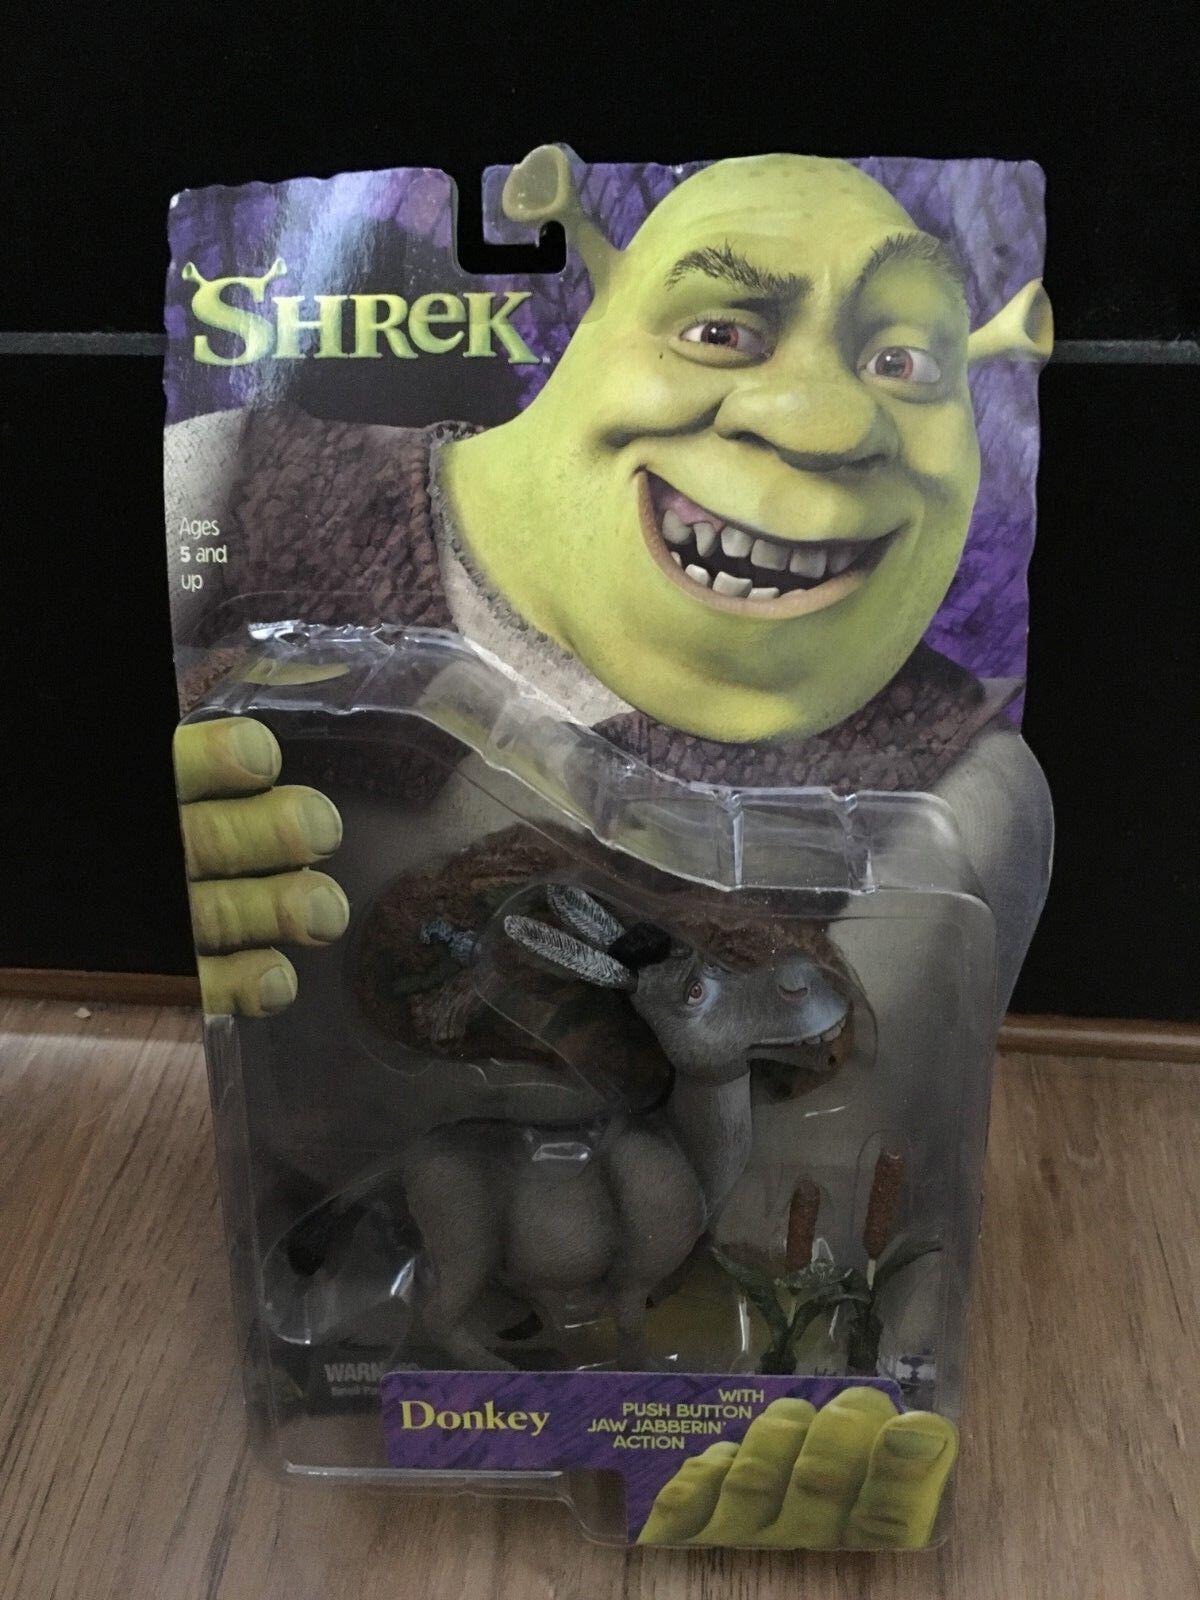 Shrek Movie - Donkey figure, McFarlane Toys, Dreamworks, New In Box